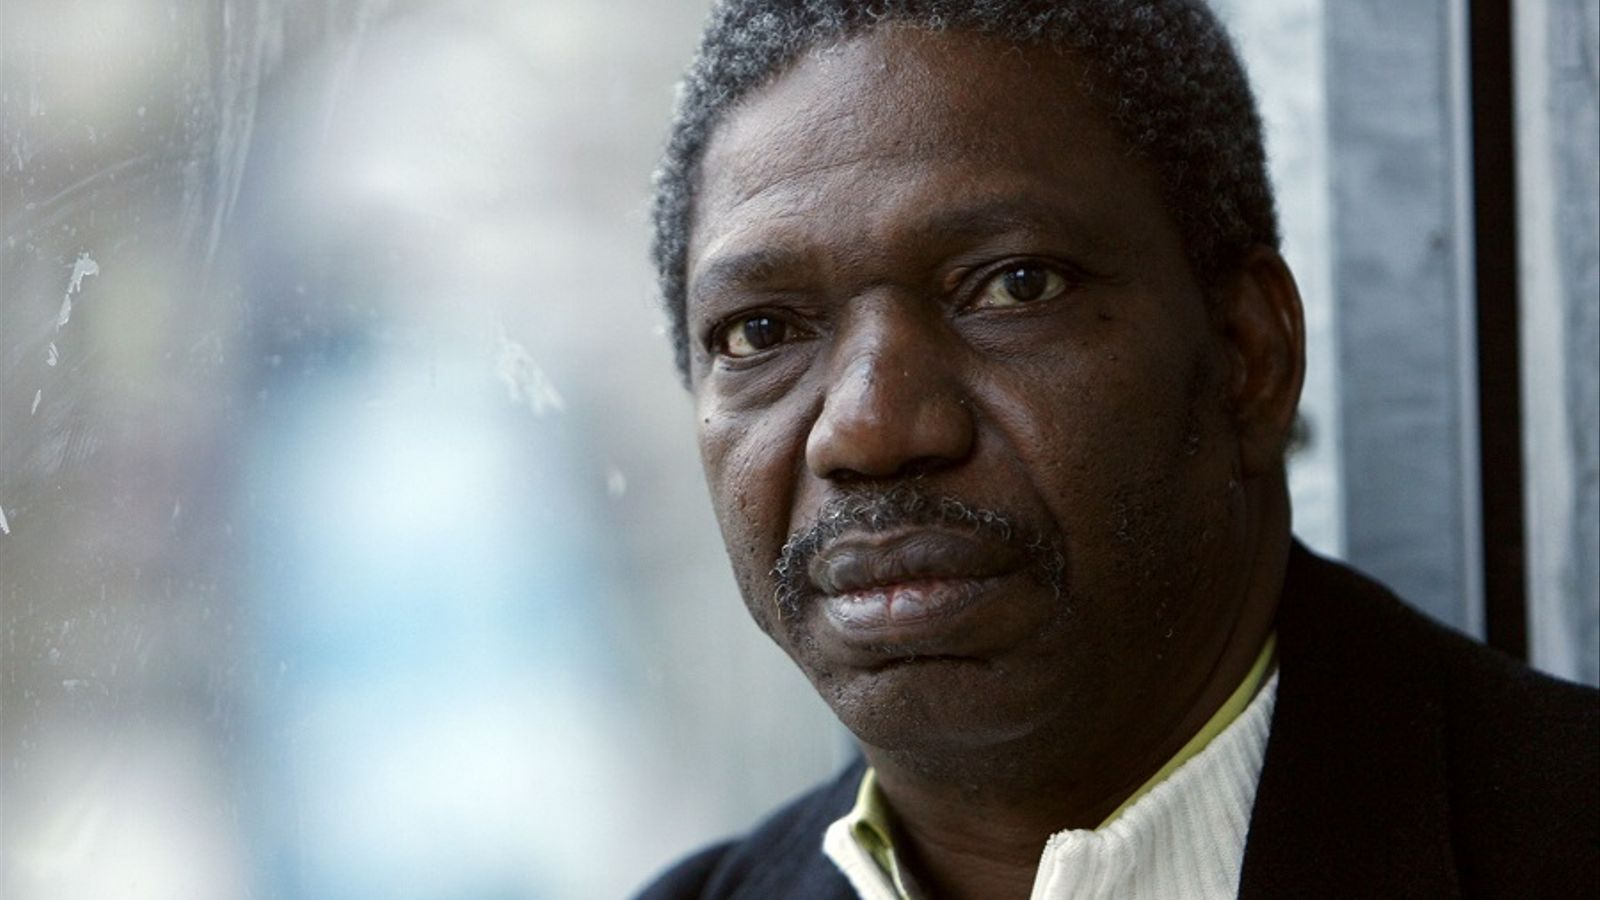 Idrissa Ouedraogo en una imatge del 2008 a París